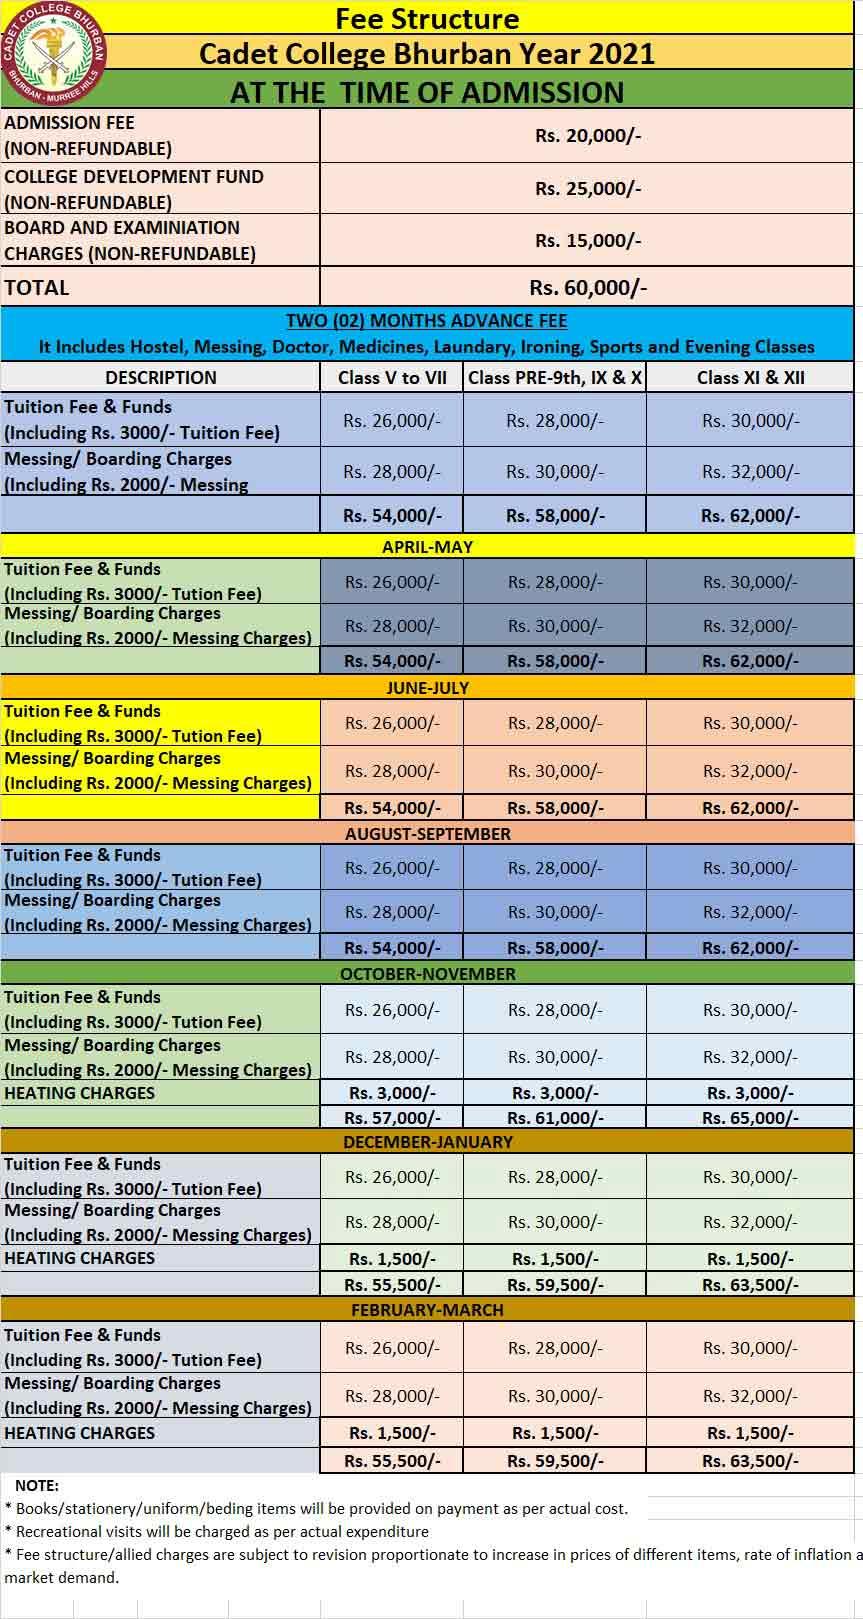 Cadet-College-Bhurban-Fee-Structure-2021